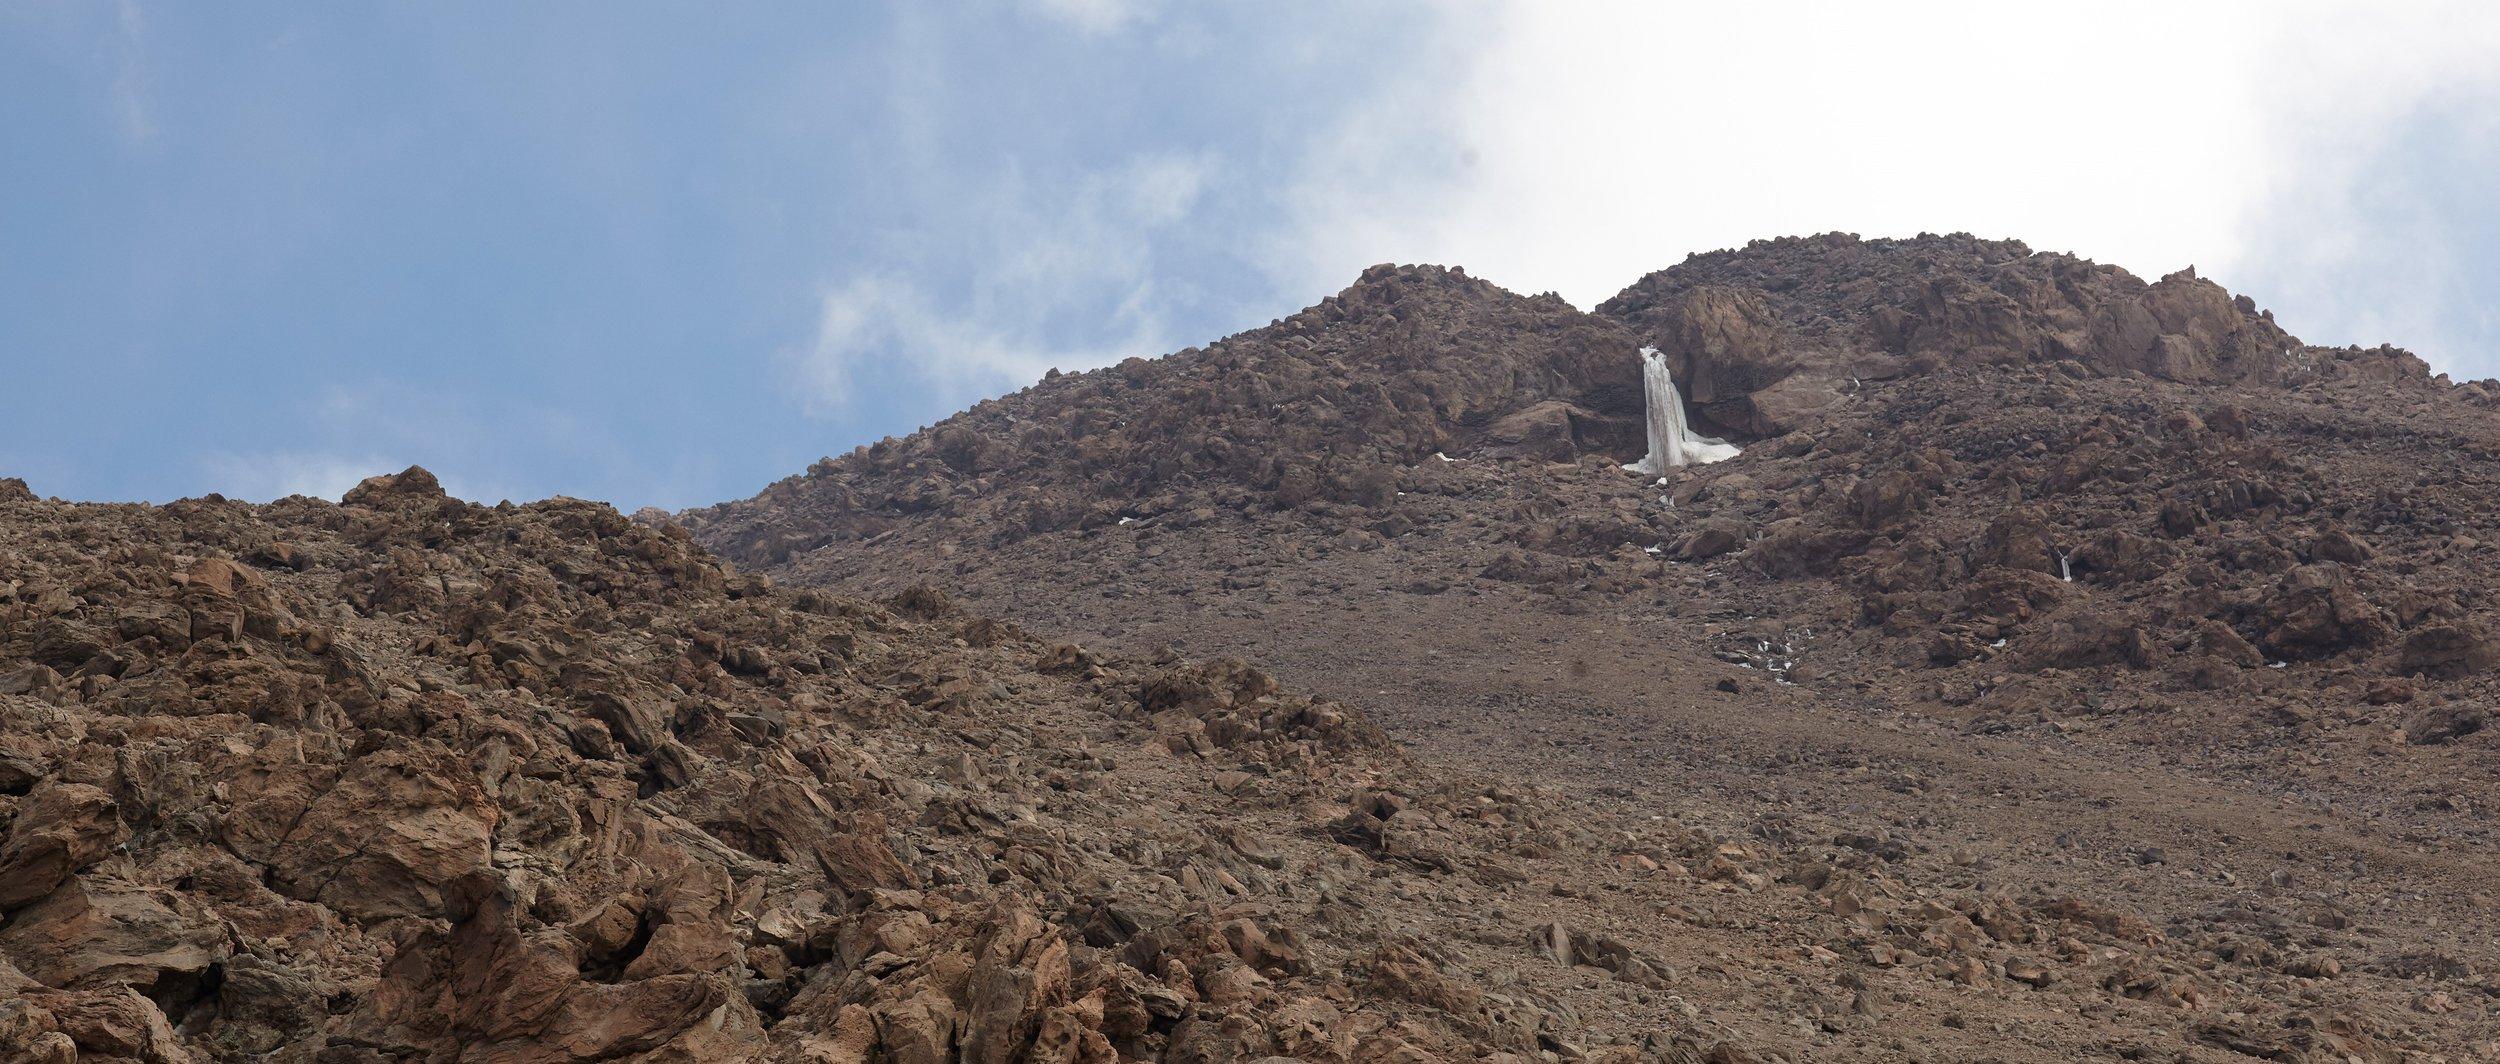 Frozen Waterfall at 5030m altitude, Mt. Damavand, Iran